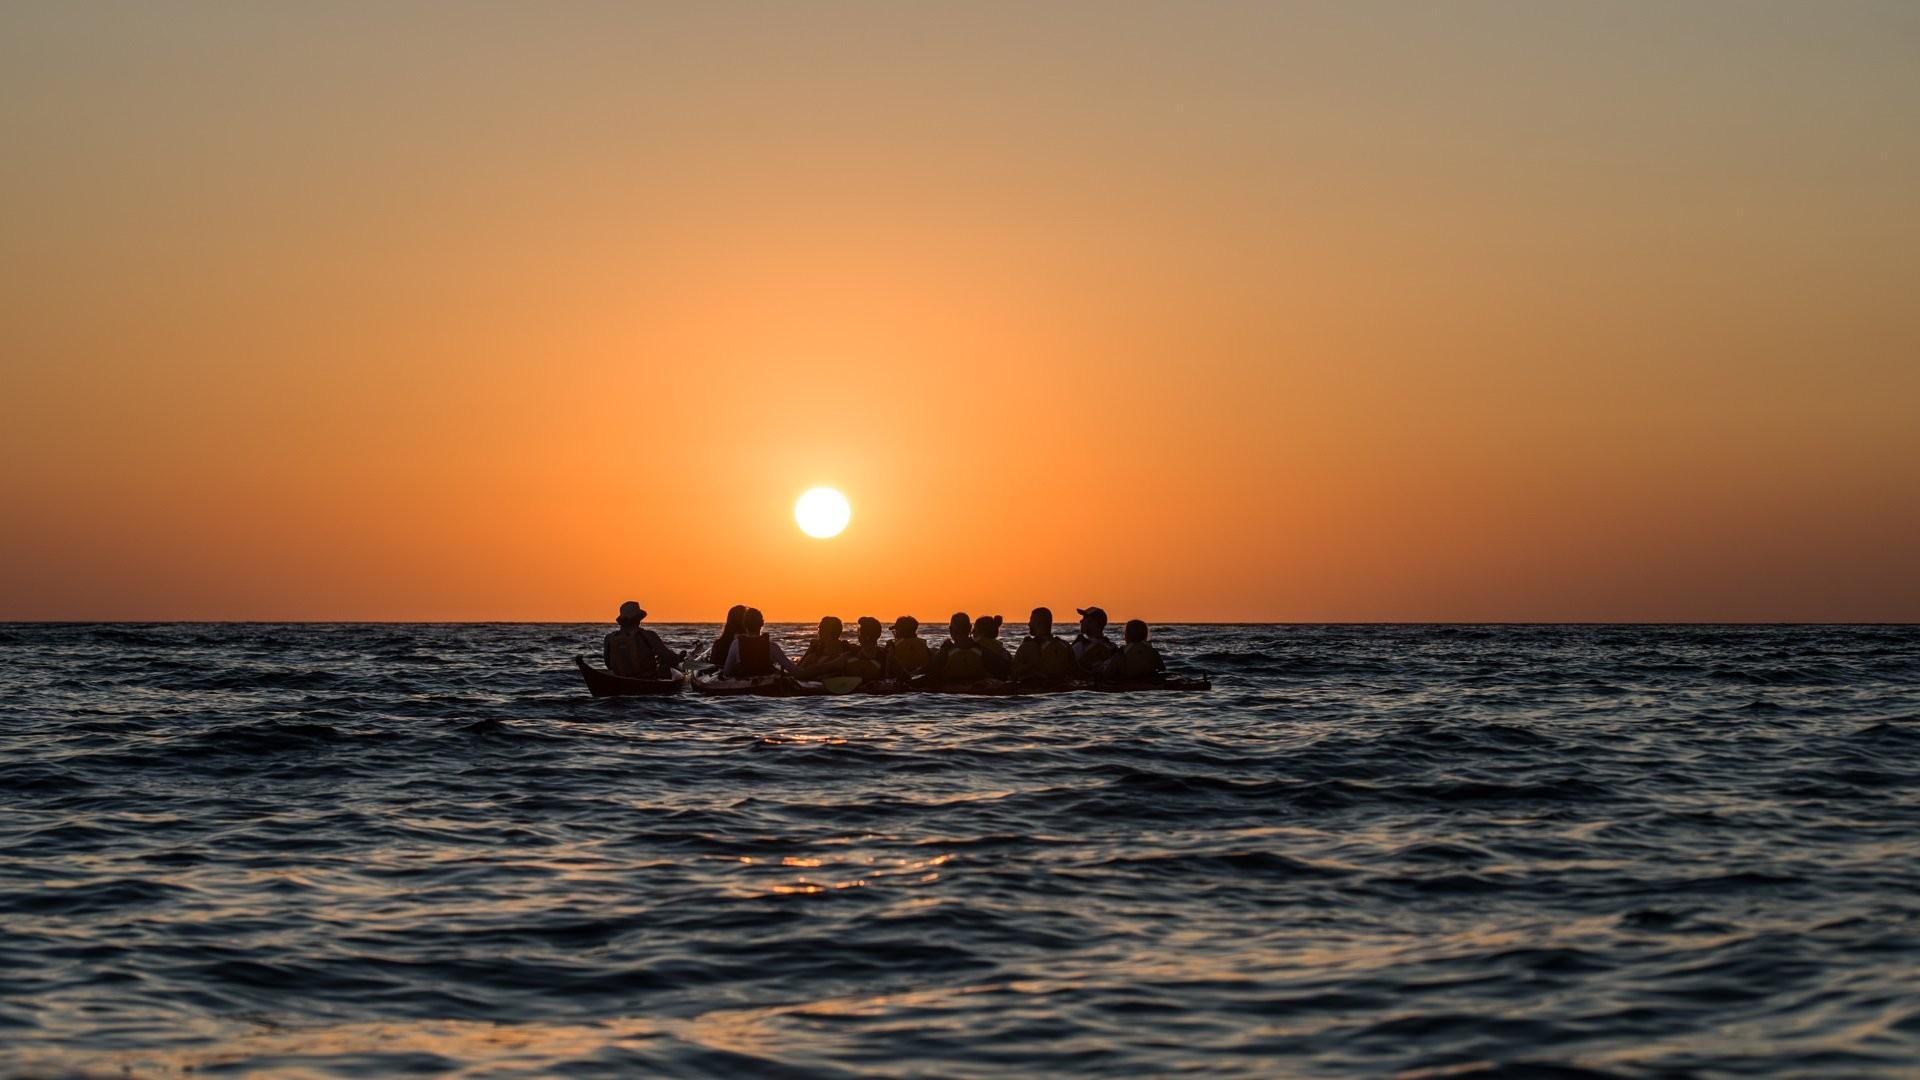 Santorini Sunset Sea Kayak